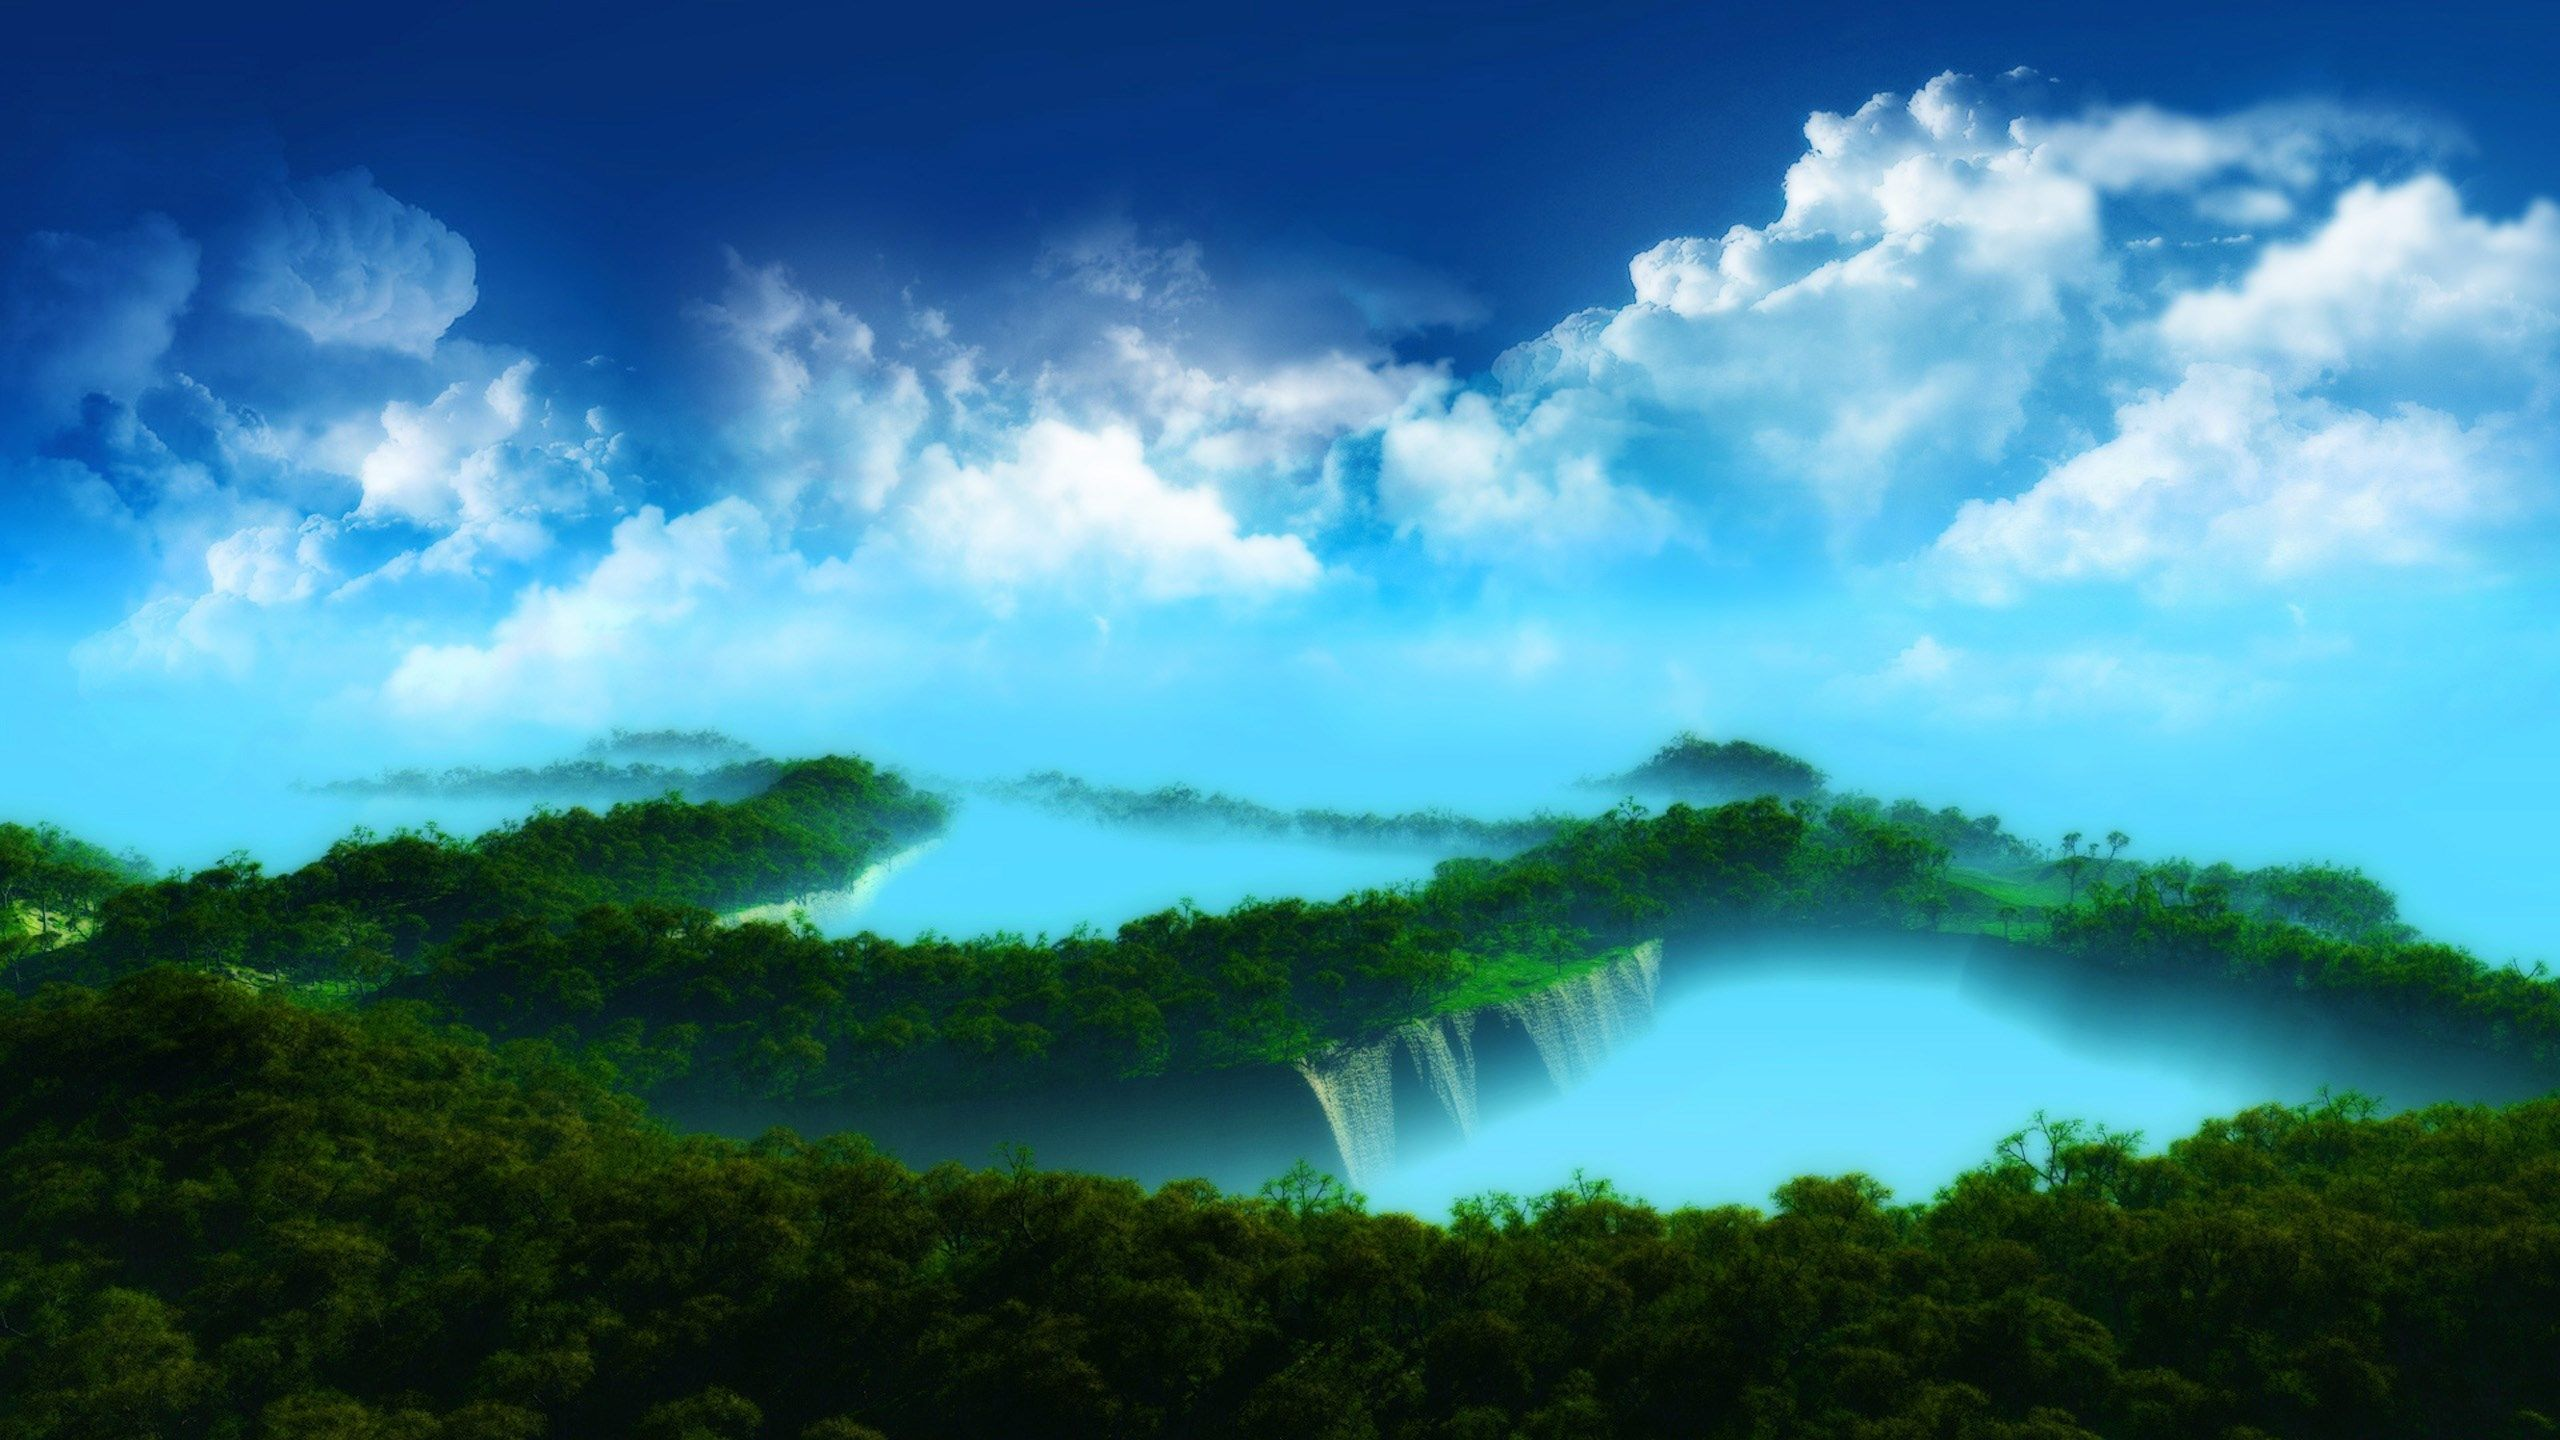 2560x1440 Widescreen Hd Landscape Beautiful Nature Wallpaper Hd Hd Nature Wallpapers Beautiful Nature Wallpaper